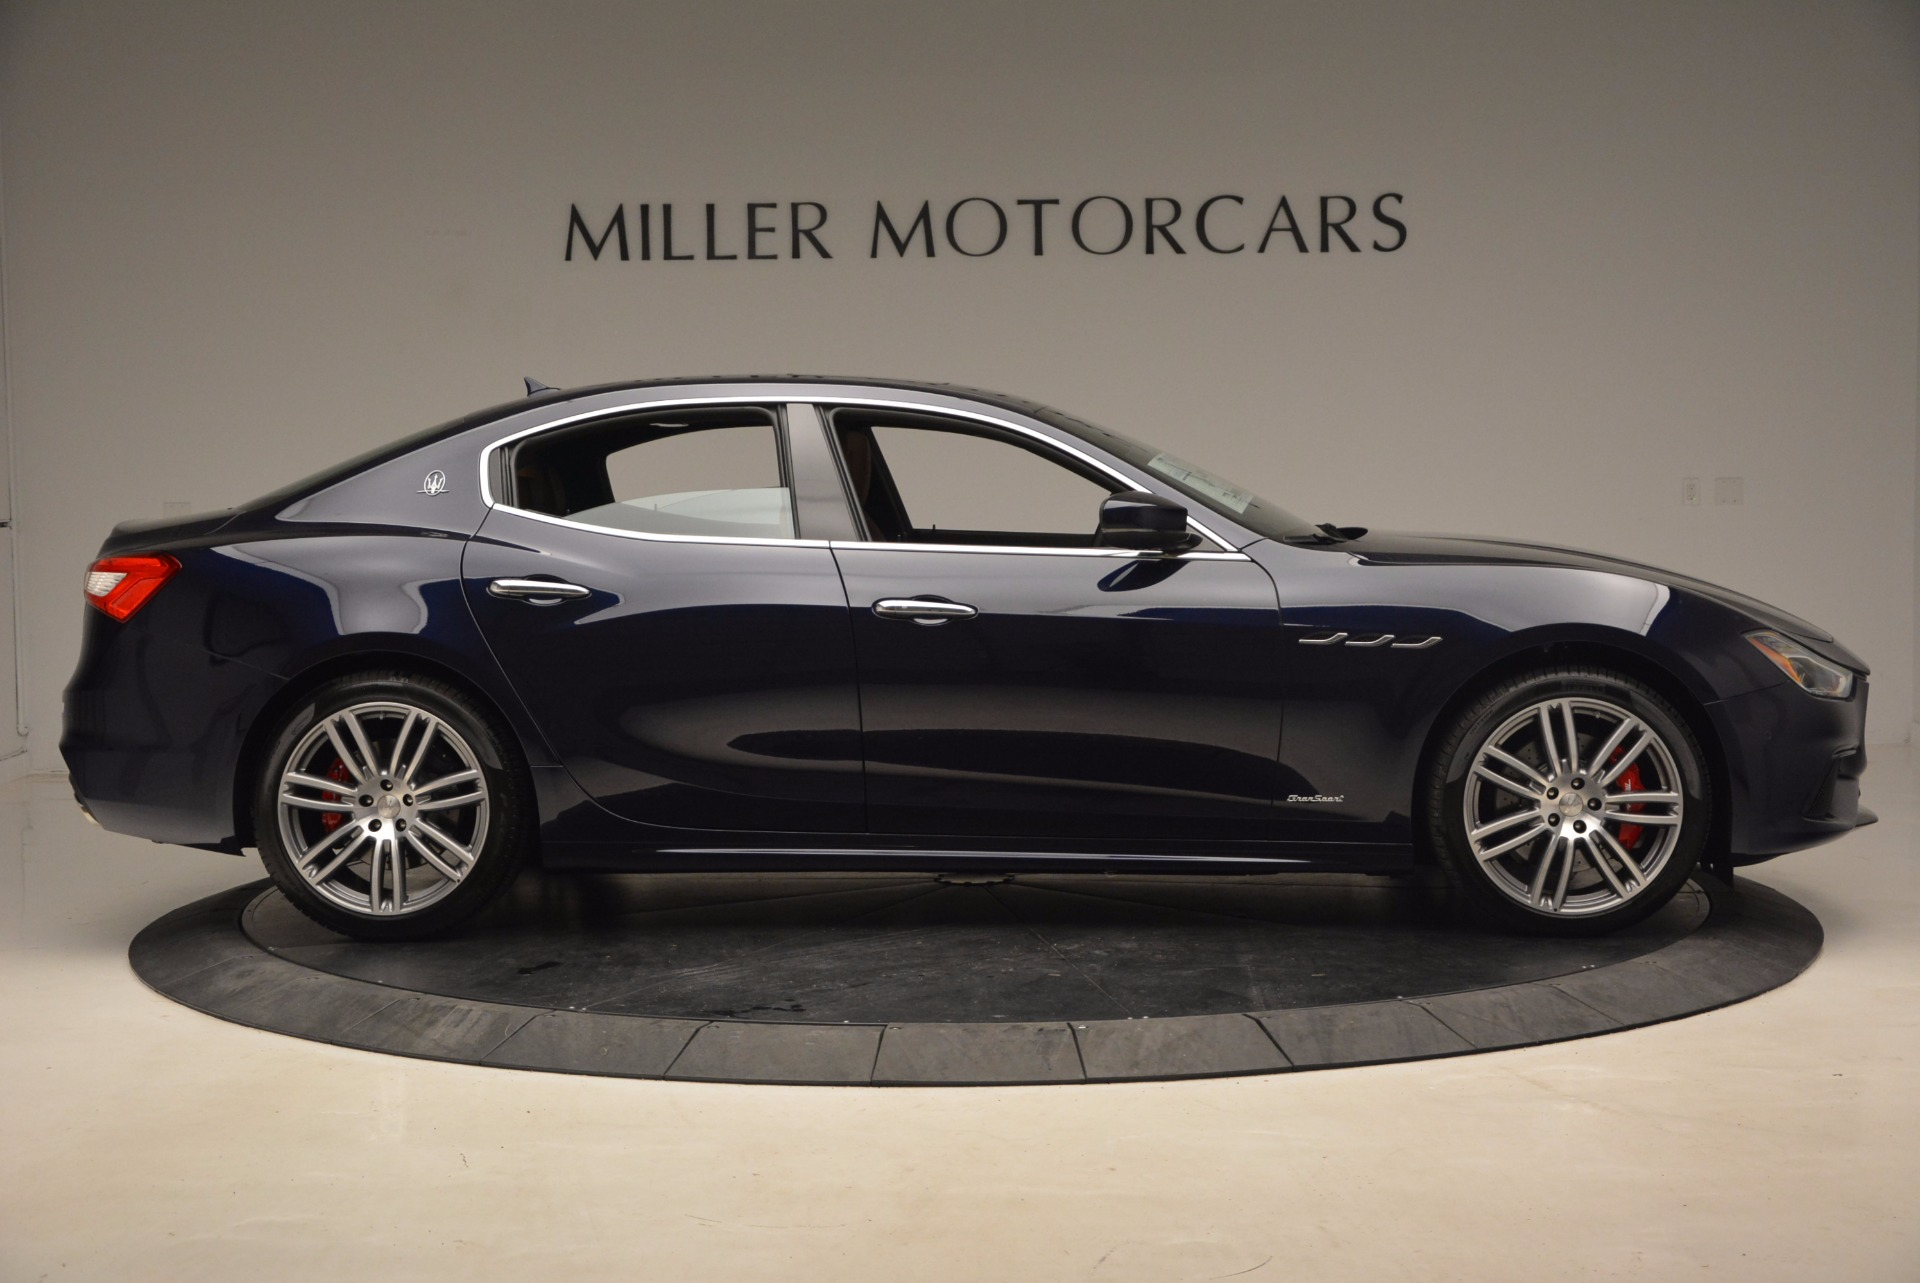 New 2018 Maserati Ghibli S Q4 Gransport For Sale In Greenwich, CT 1562_p9